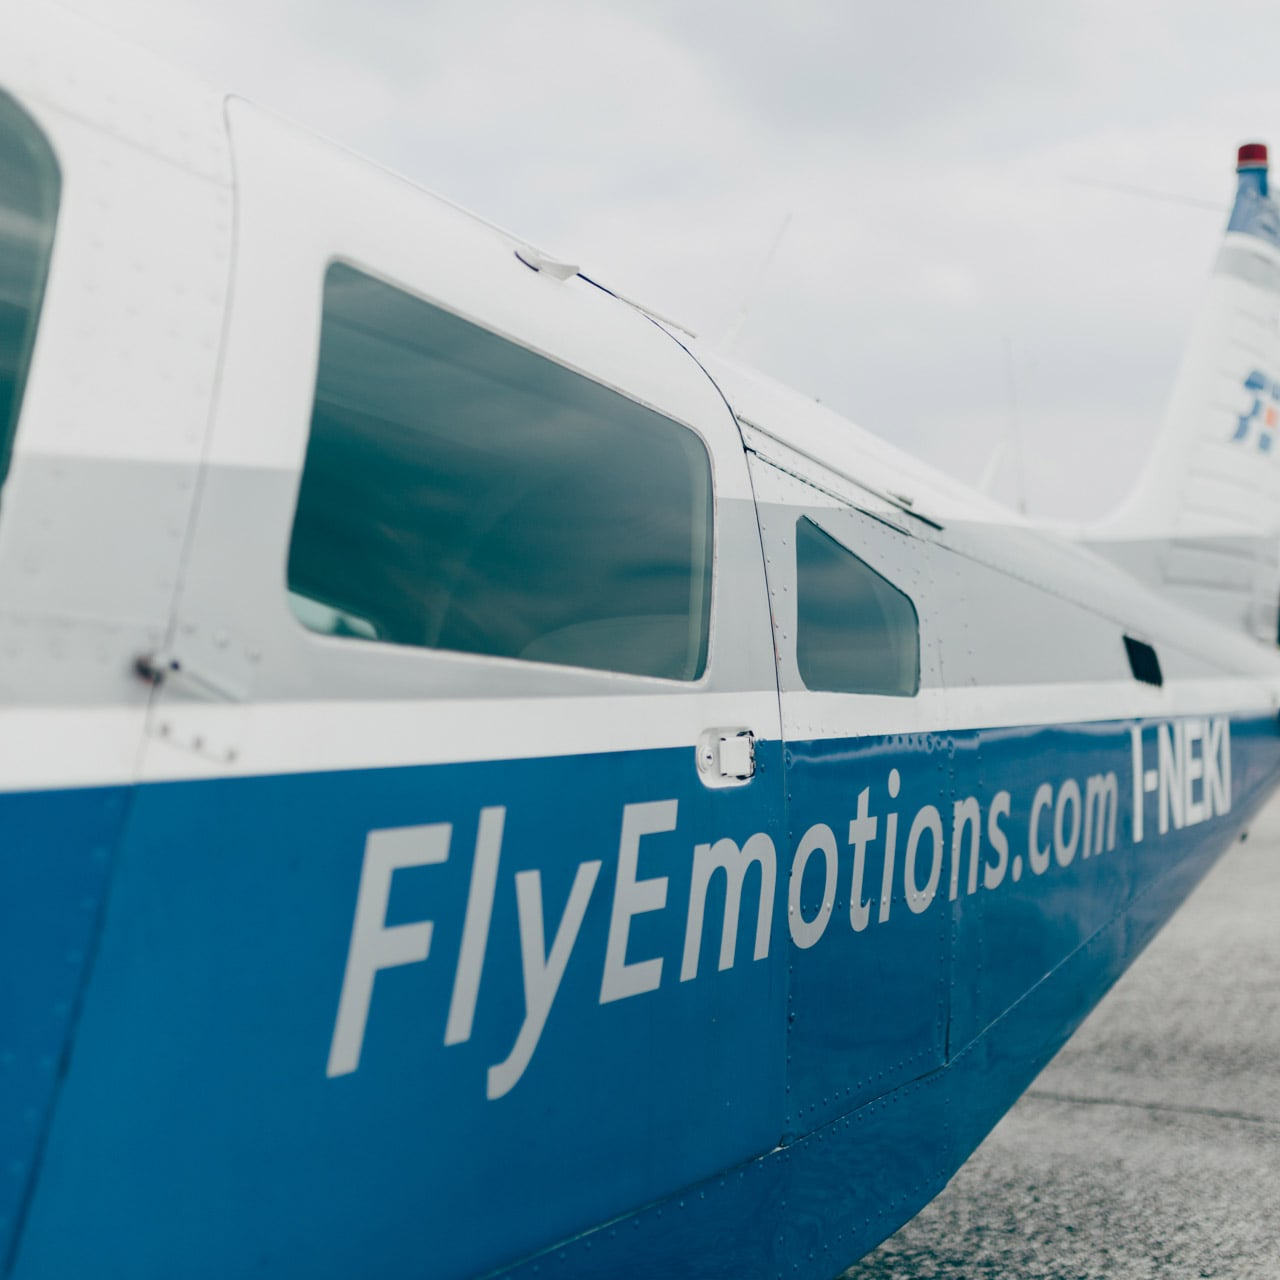 FlyEmotions-004-small-min